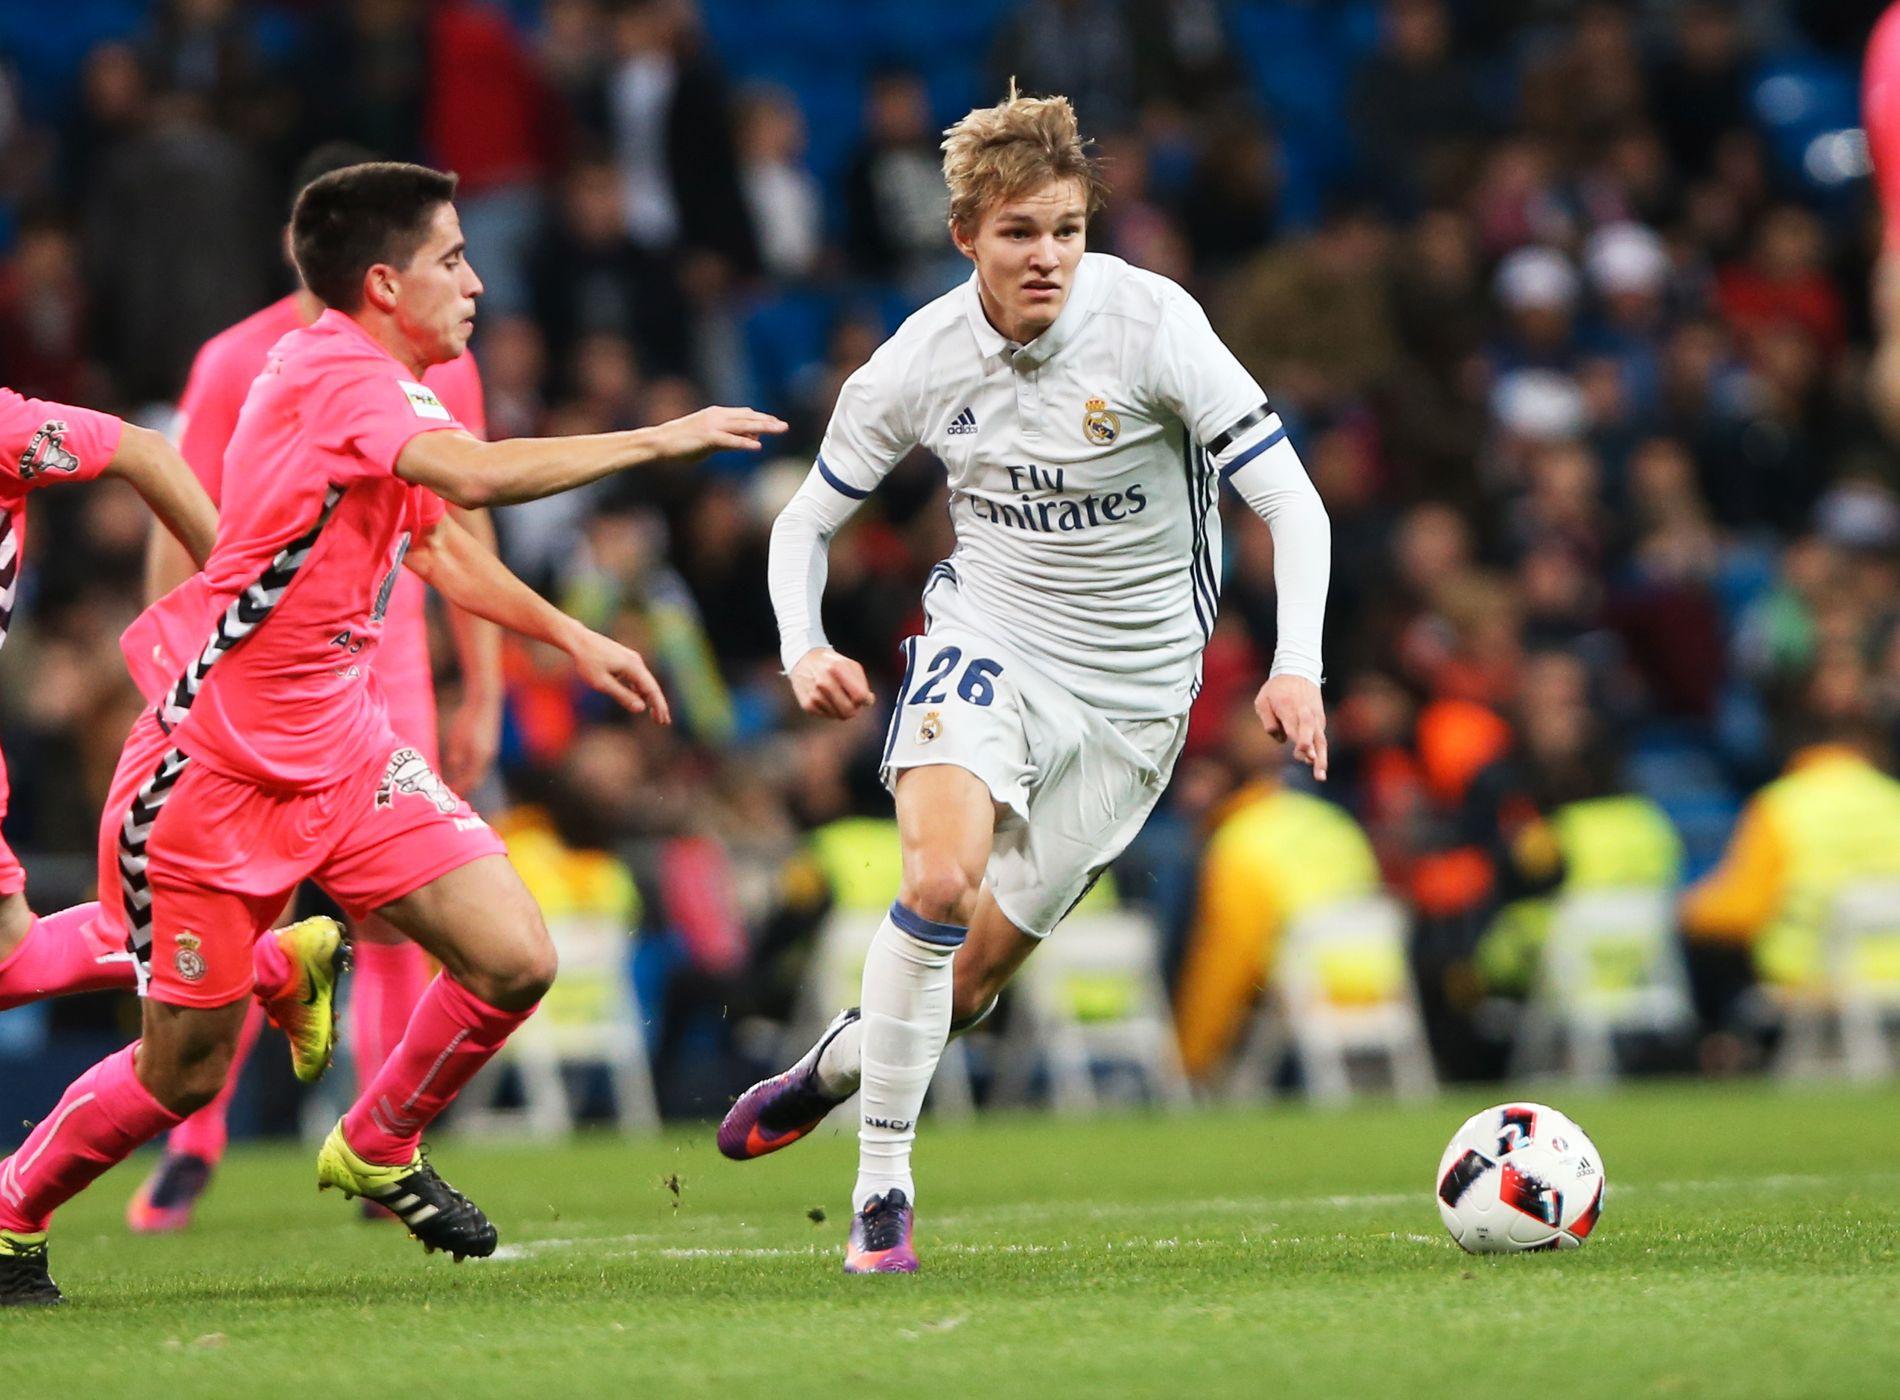 FIKK SKRYT: Martin Ødegaard viste mange gode involveringer da han startet sin første obligatoriske kamp for Real Madrid i onsdagens cupkamp mot Cultural Leonesa. Real Madrid vant kamp med 6-1.